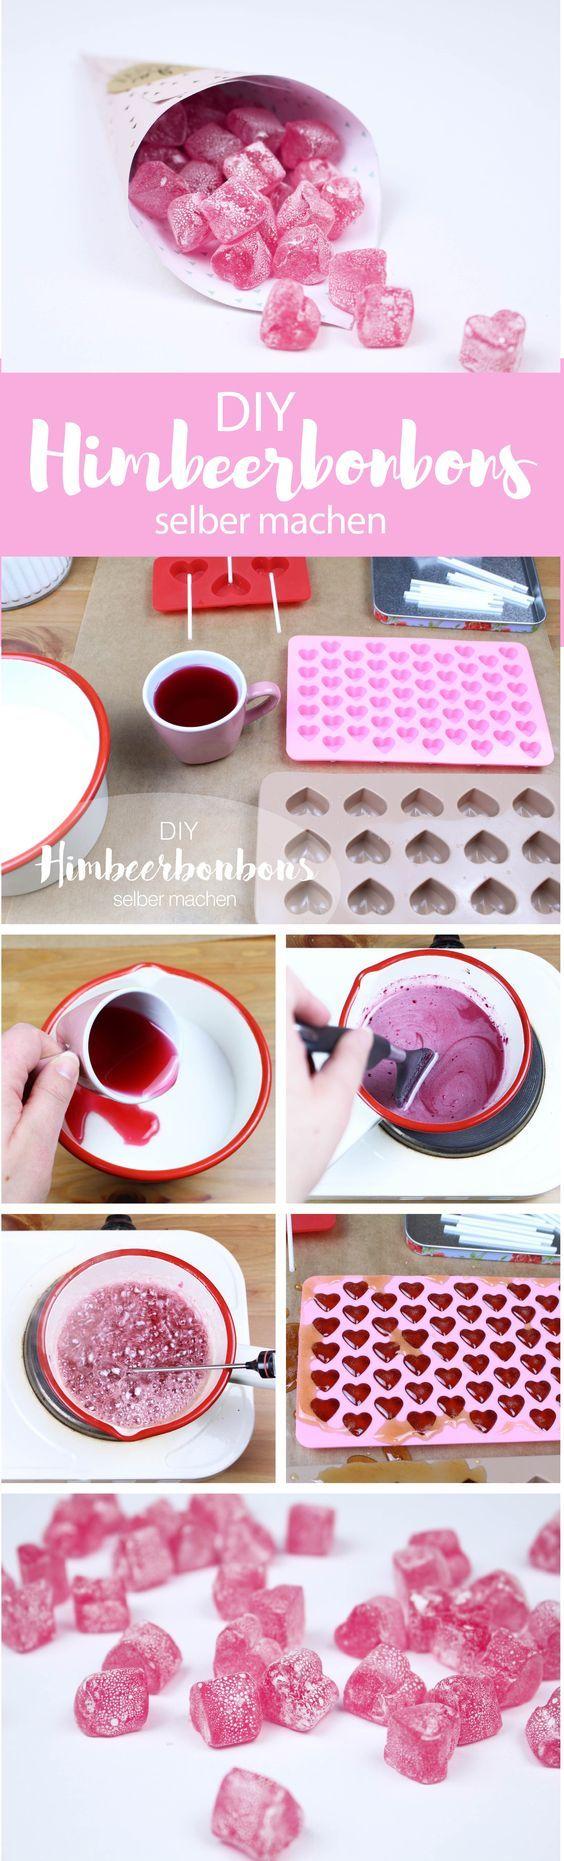 rezept himbeerbonbons einfach selber machen gummy bonbons selber machen bonbon und s igkeiten. Black Bedroom Furniture Sets. Home Design Ideas